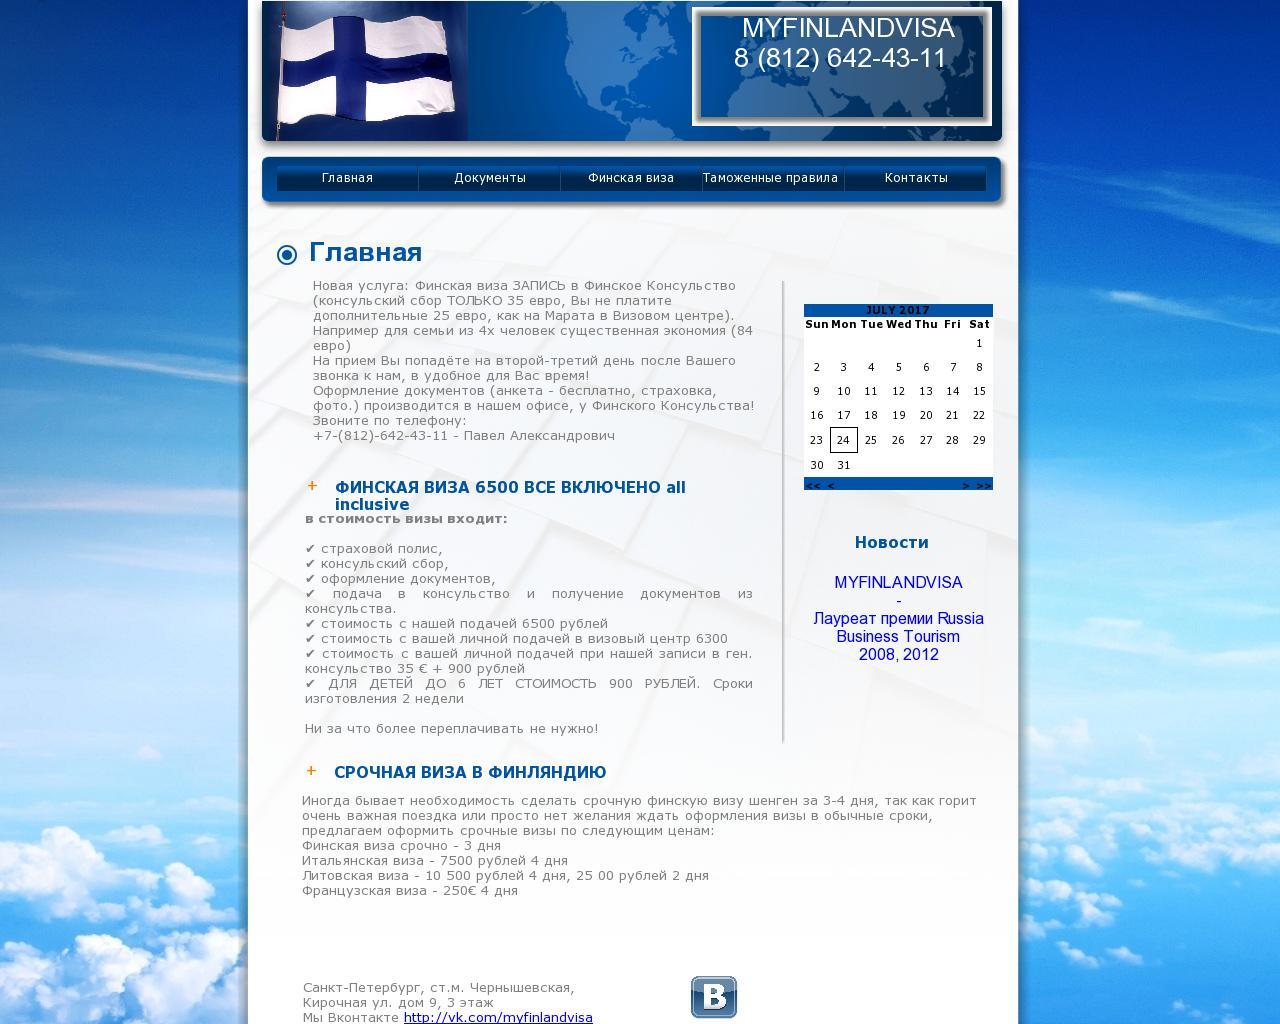 Визовый центр Финляндии на Марата в Санкт-Петербурге